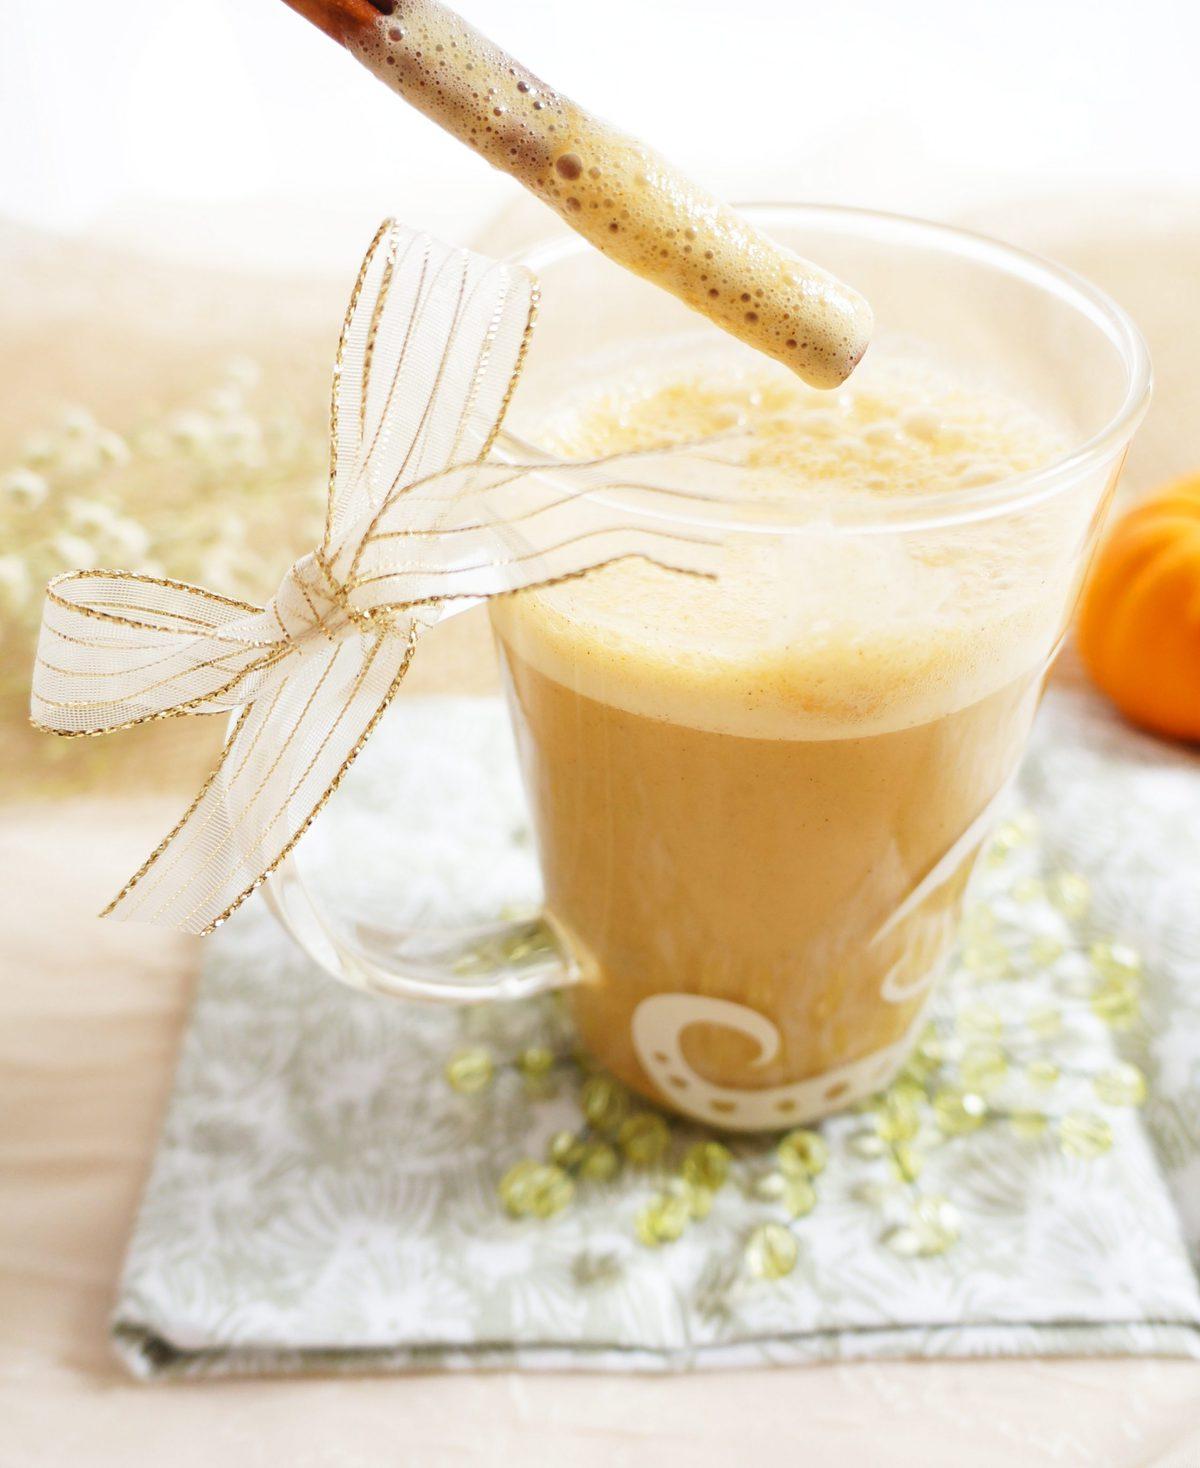 Haute  Healthy Living Maple Pumpkin Spice Latte Haute  Healthy